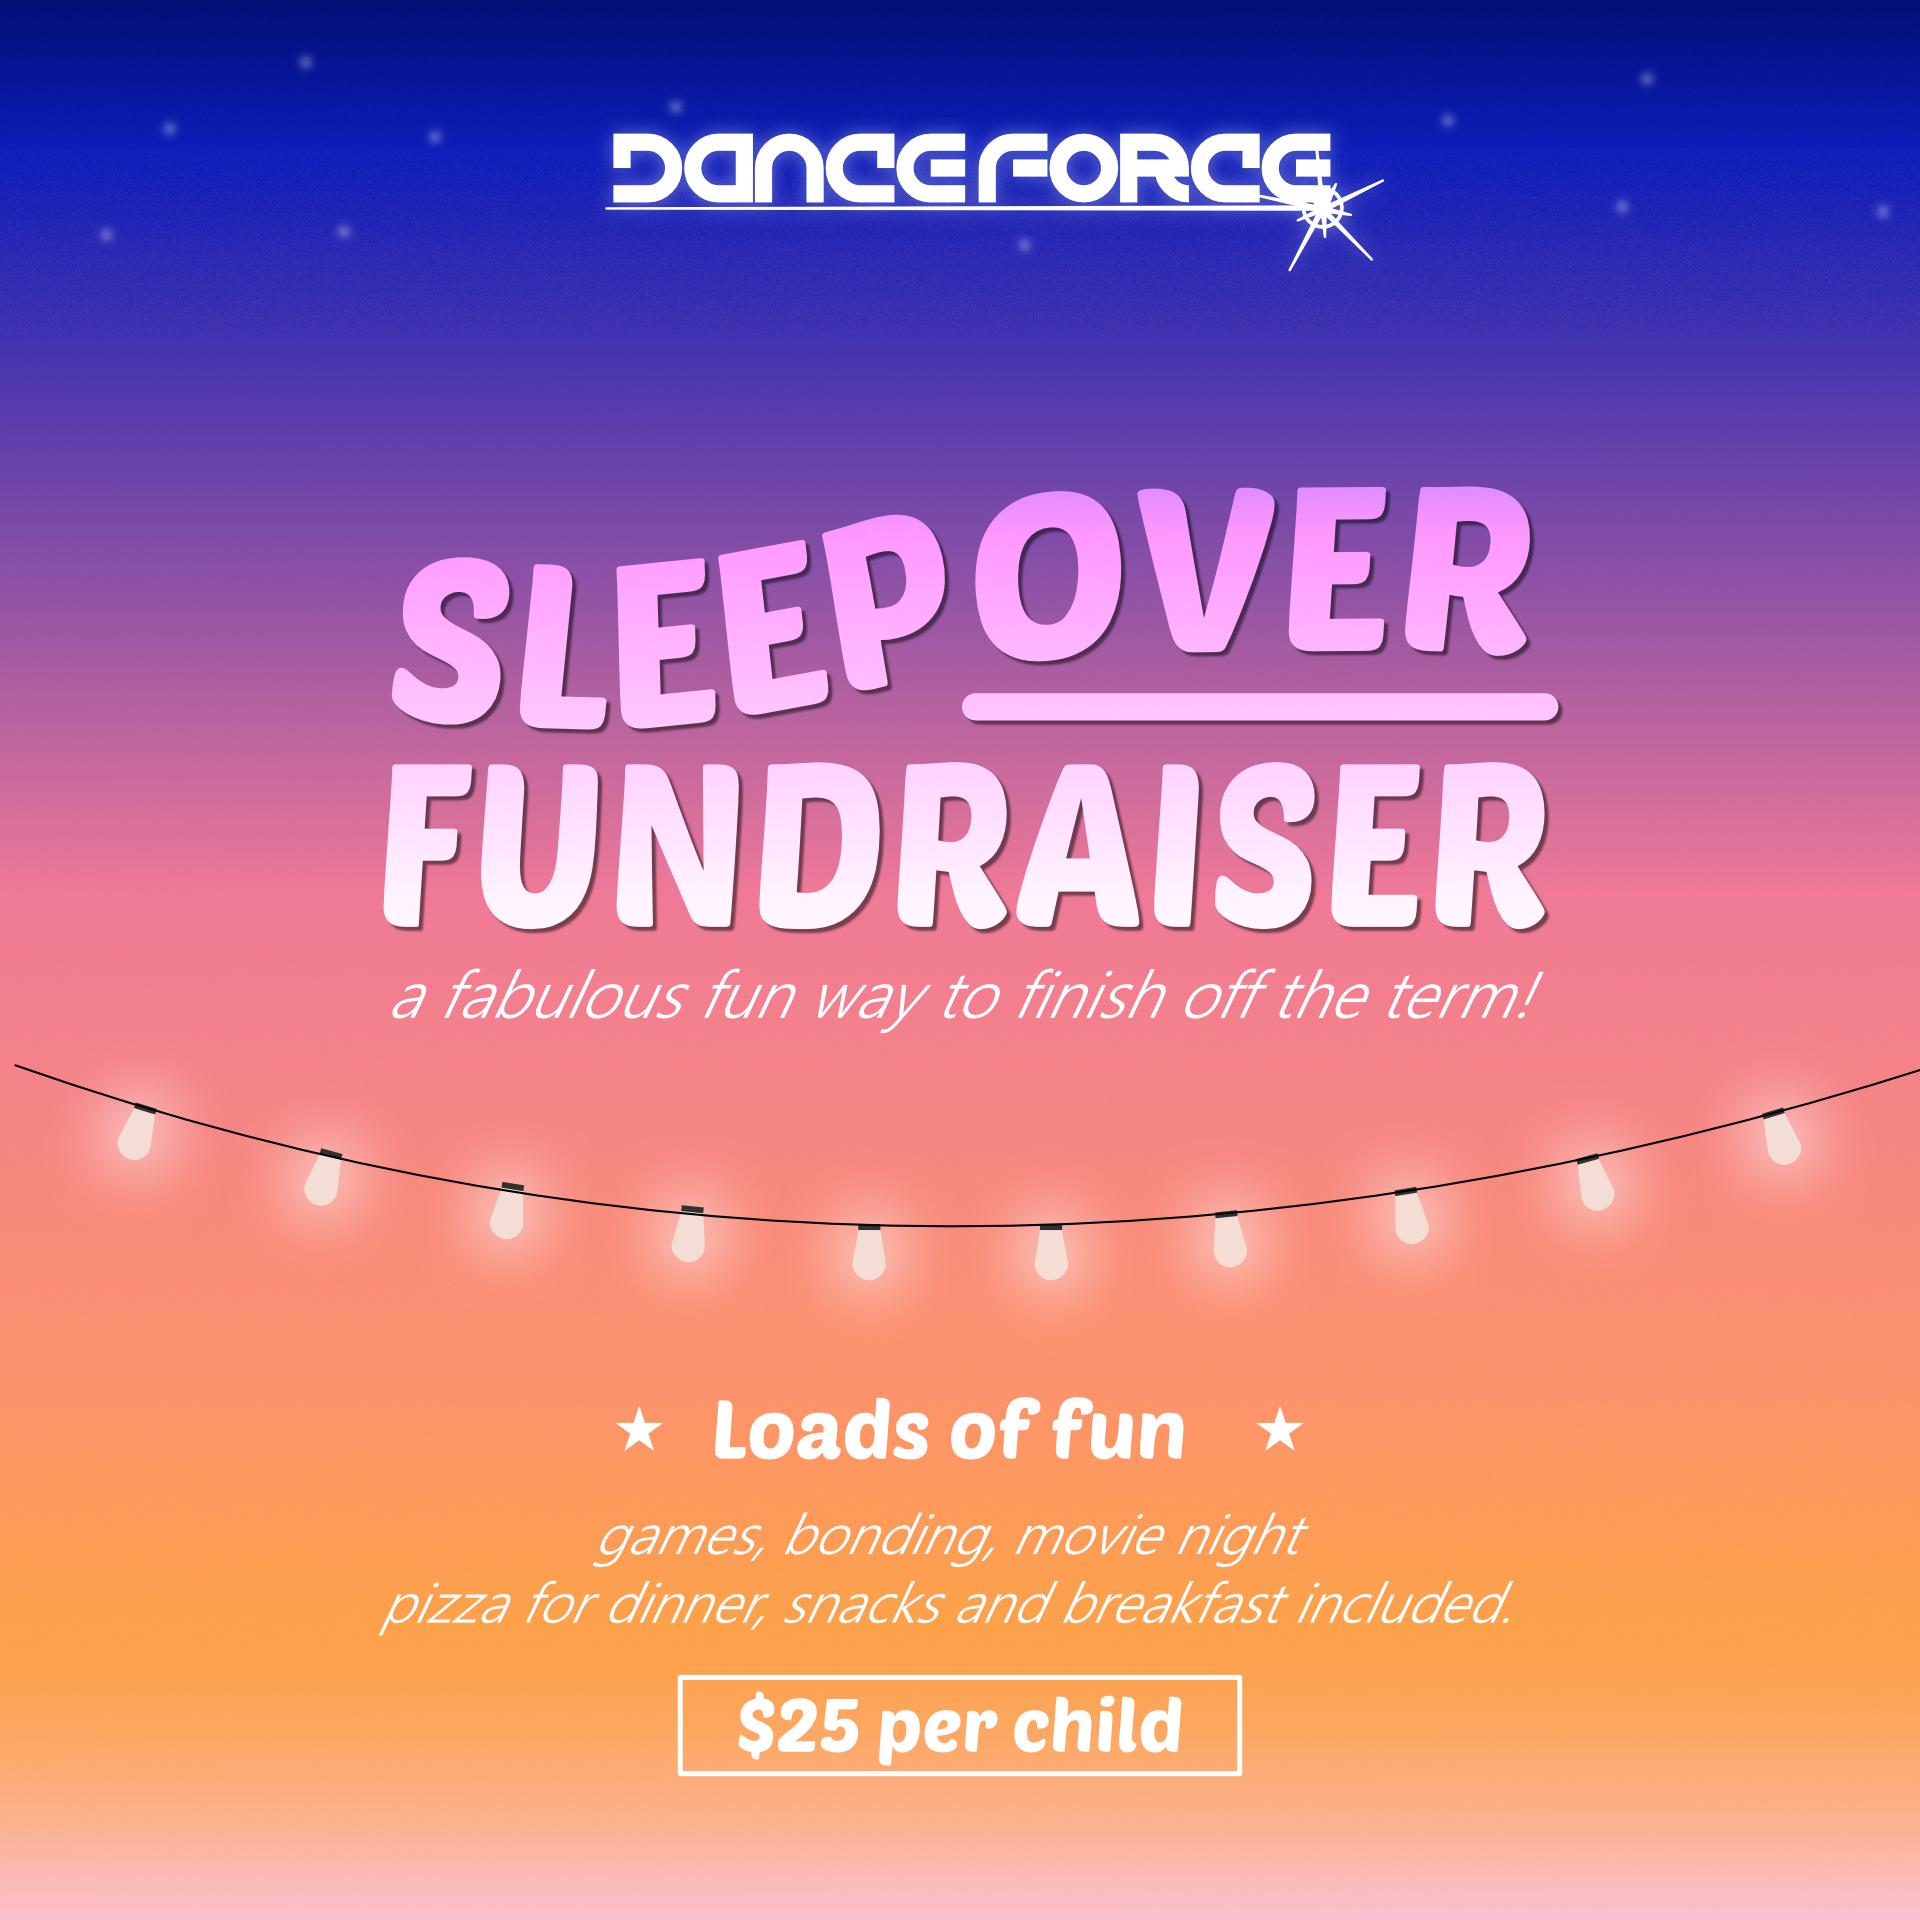 Sleepover fundraiser